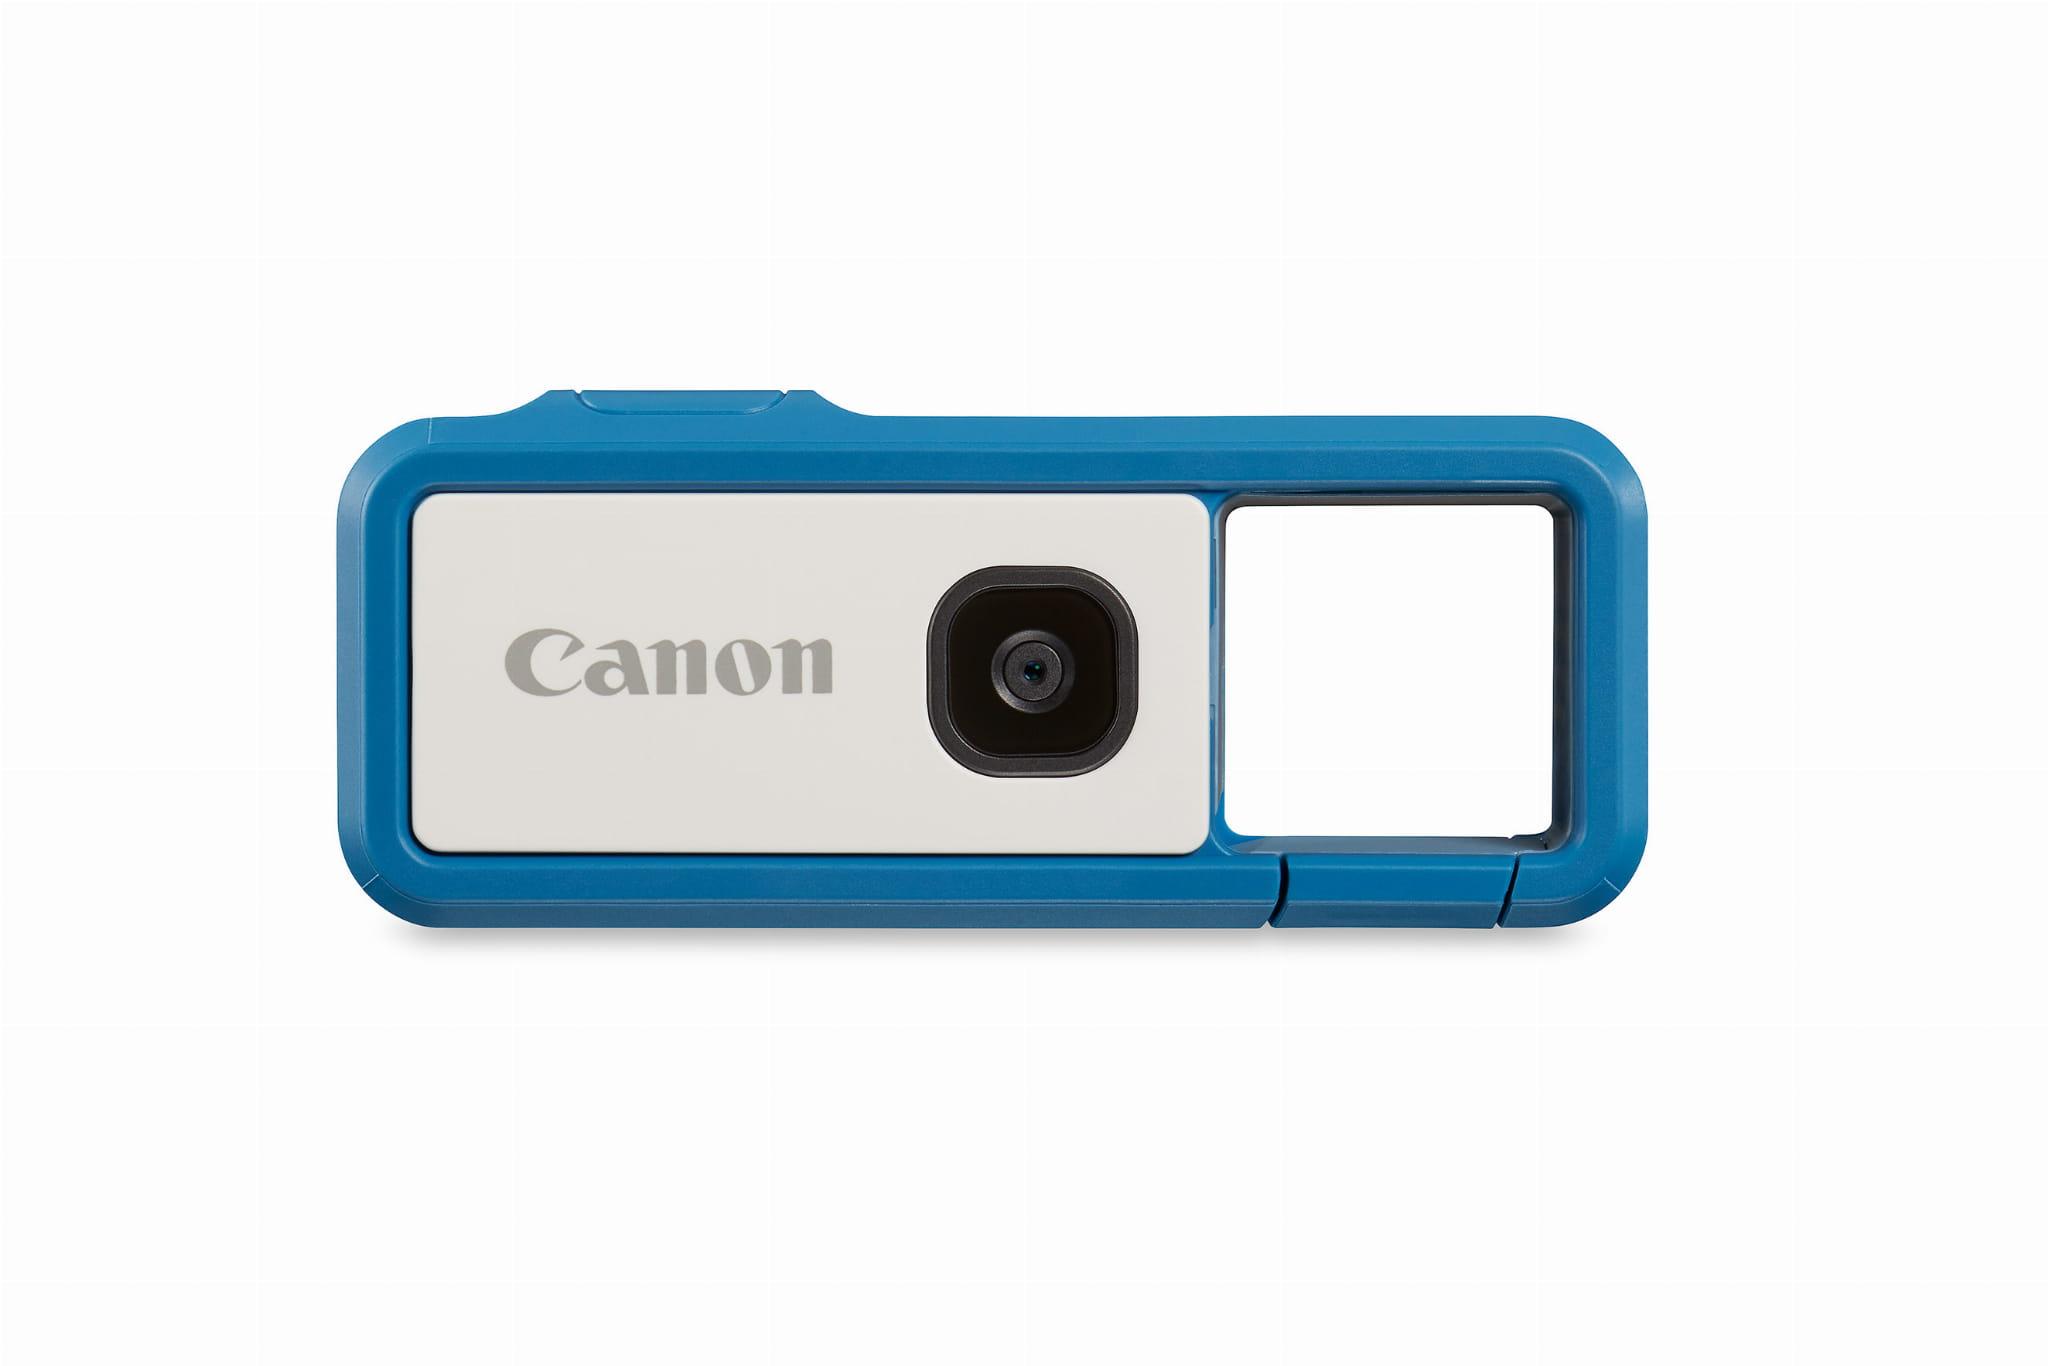 Aparat i kamera sportowa - Canon IVY REC - niebieska